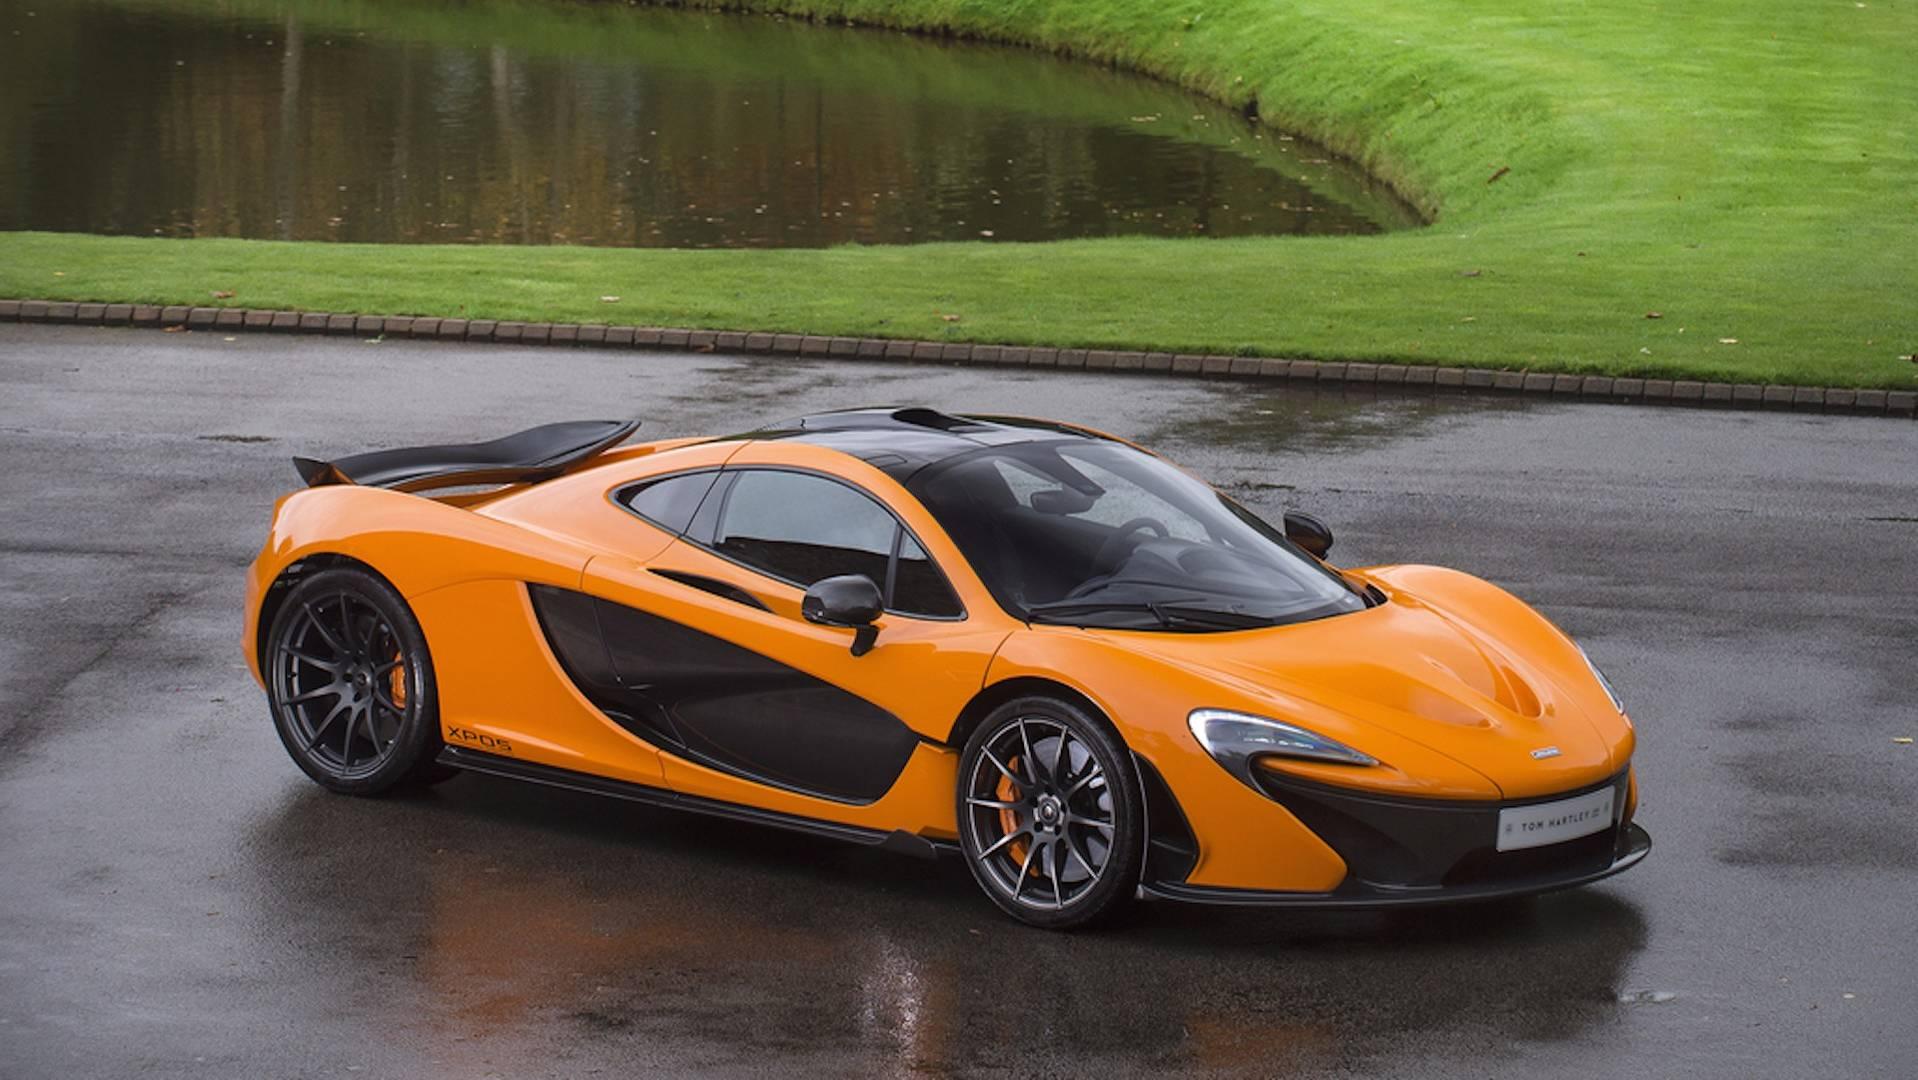 McLaren_P1_Experimental_Prototype_01